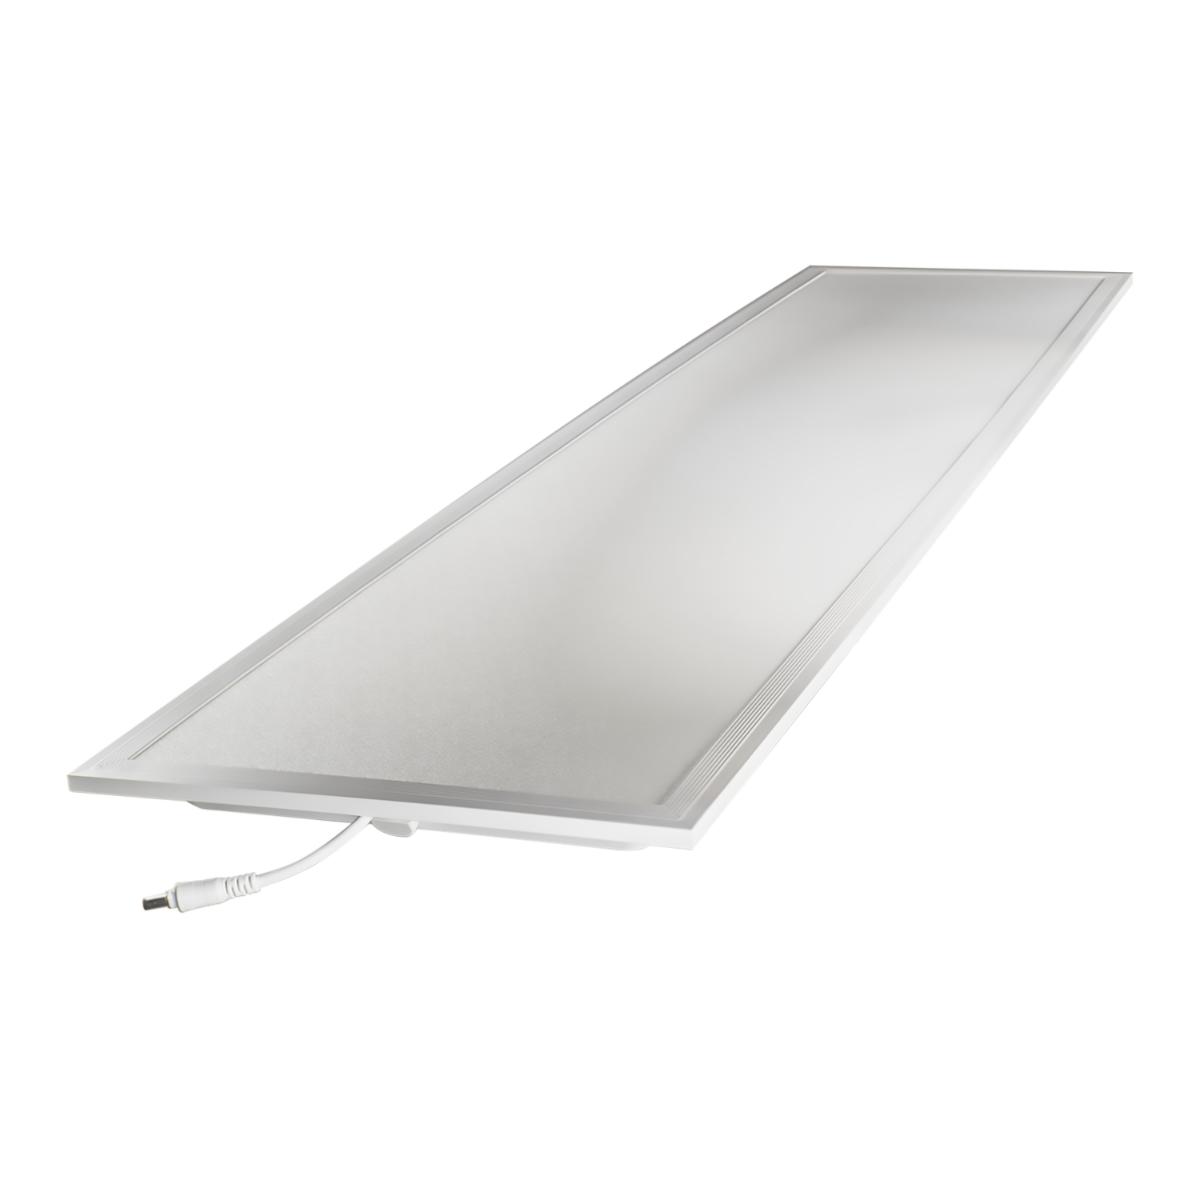 Noxion LED panel Delta Pro V2.0 Xitanium DALI 30W 30x120cm 3000K 3960lm UGR <19 | Dali dimbar - varm hvit - erstatter 2x36W